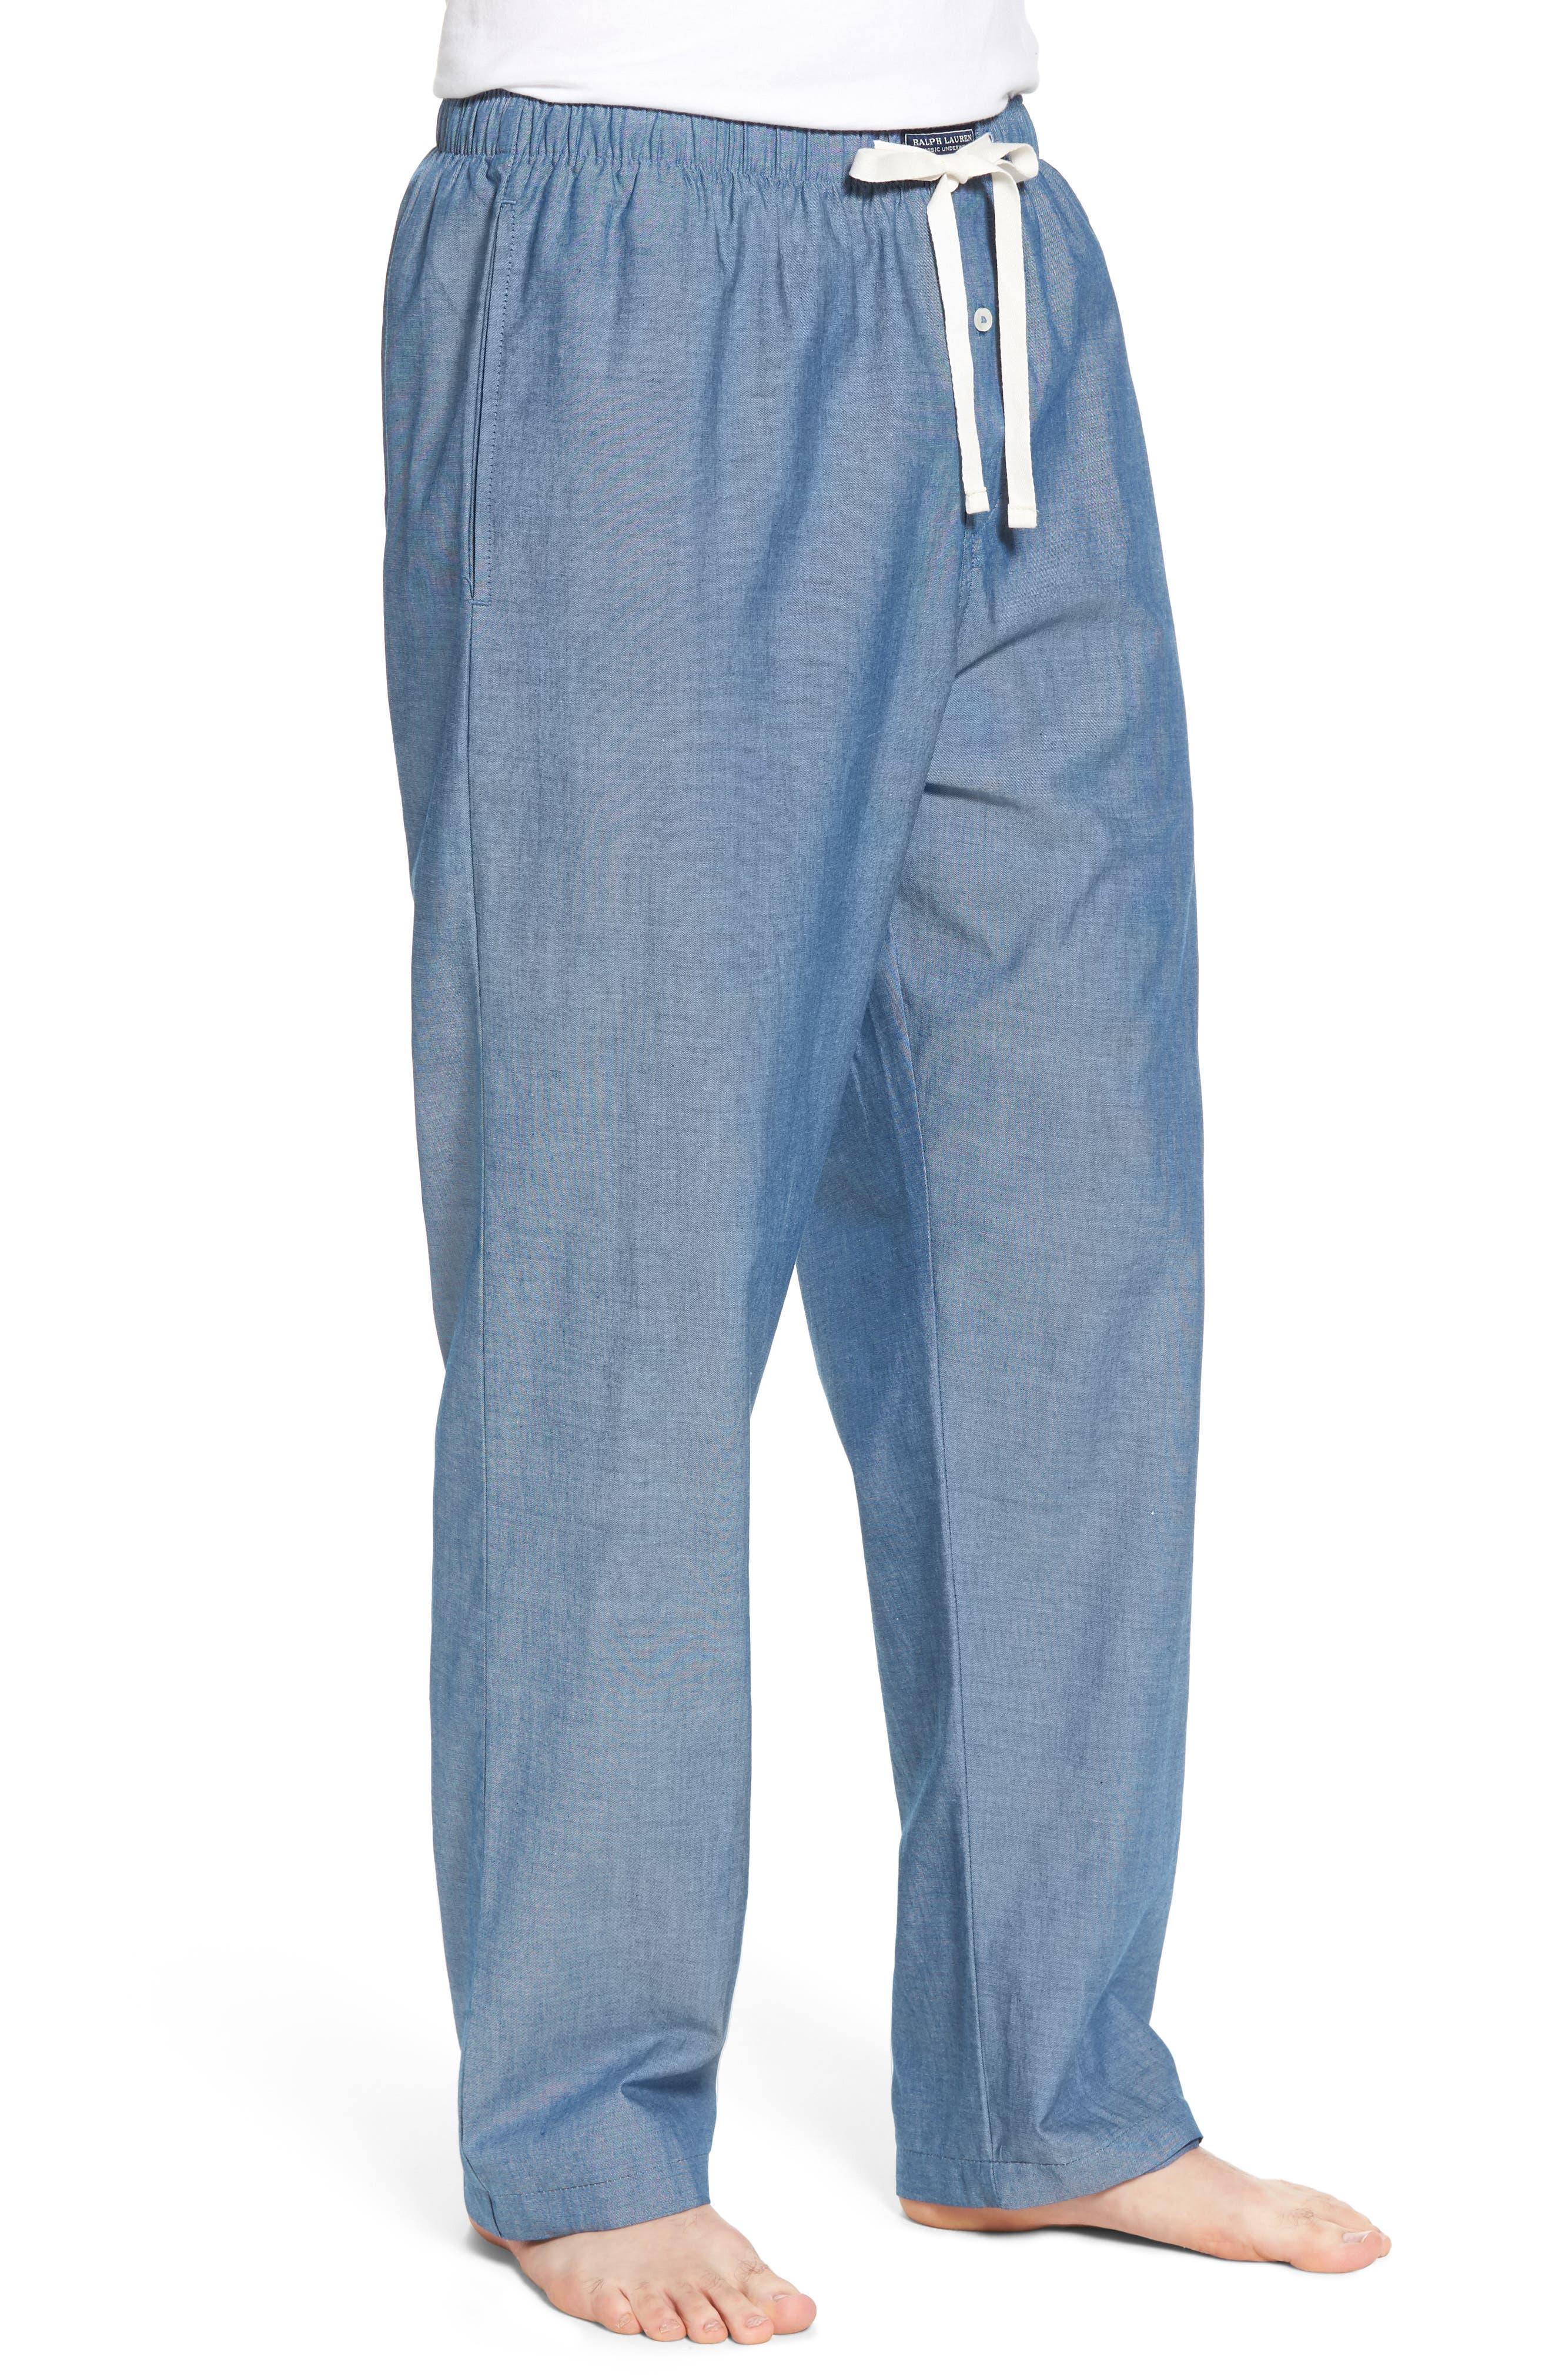 Chambray Woven Lounge Pants,                             Alternate thumbnail 3, color,                             Medium Indigo/ Dark Indigo